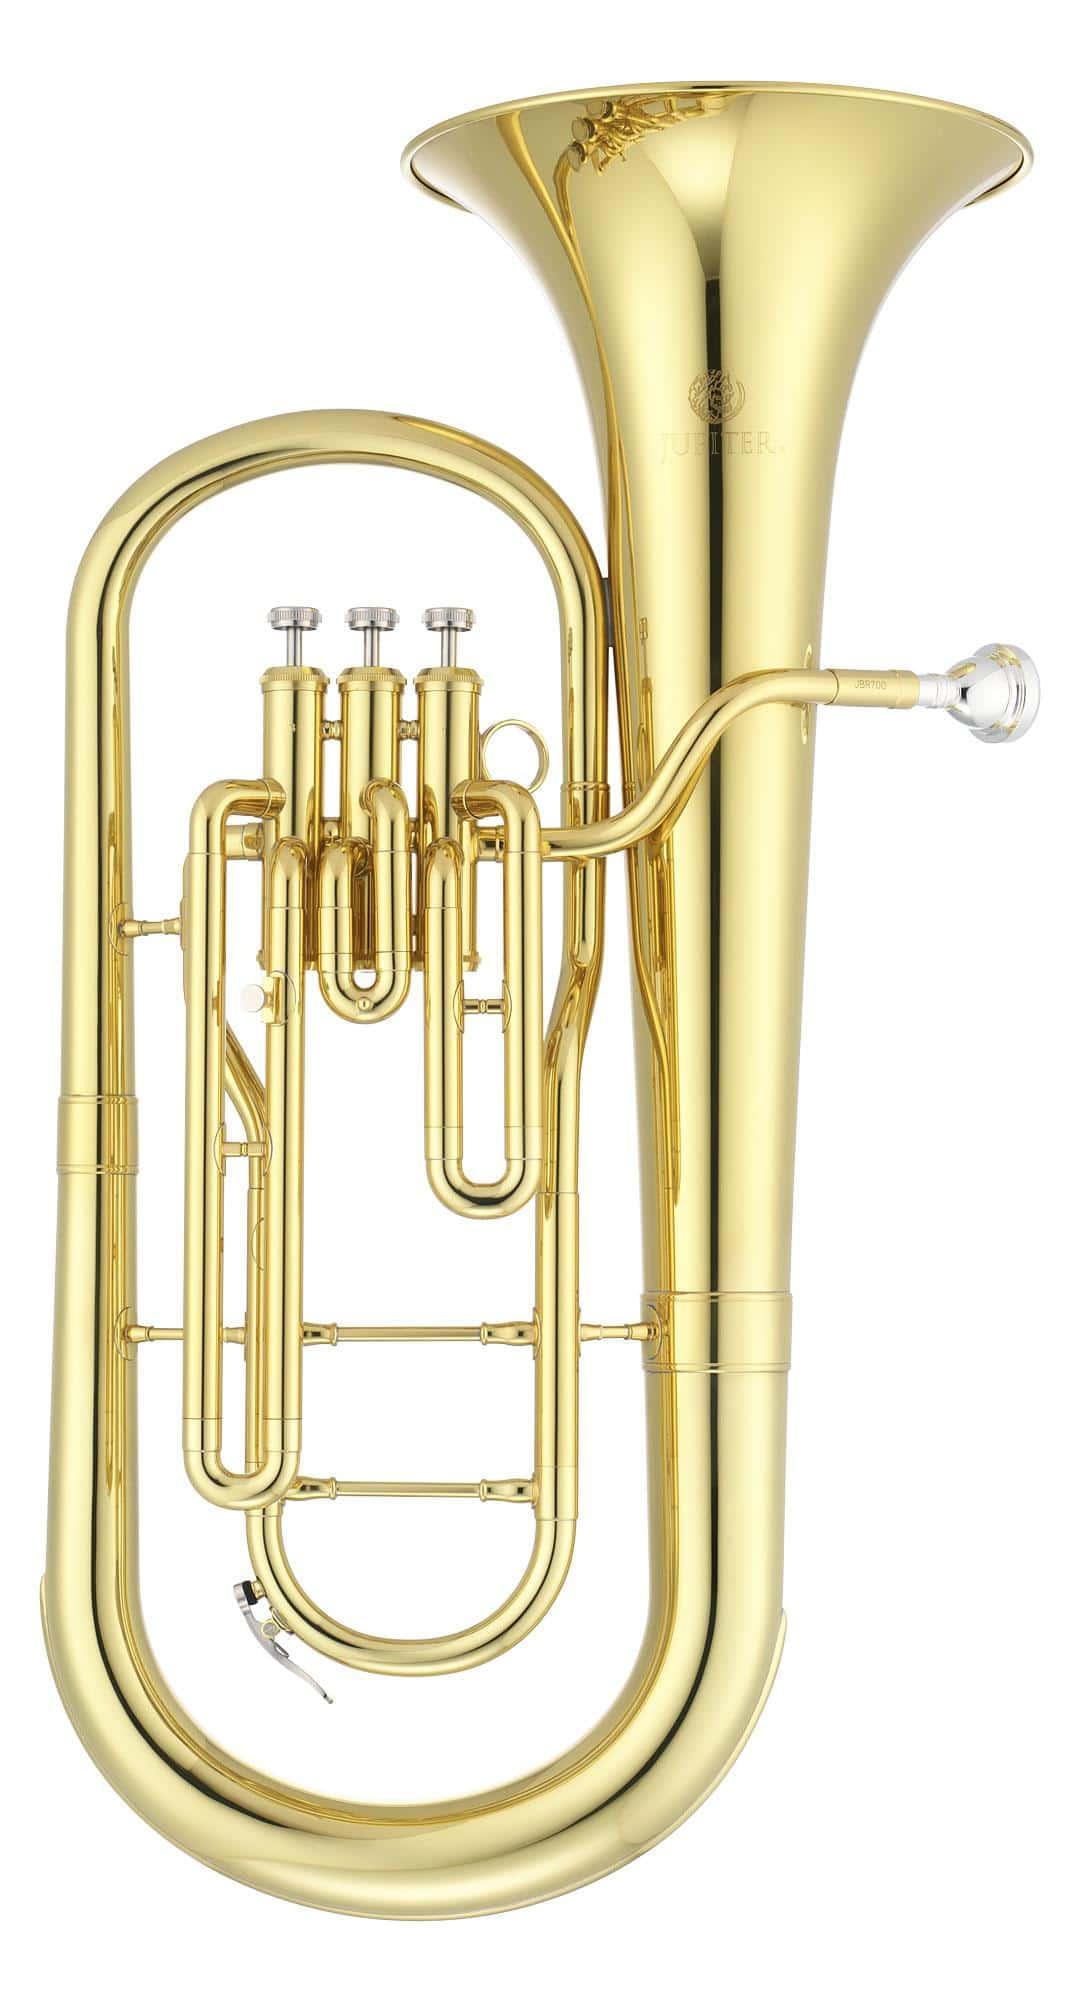 Baritone - Jupiter JBR700 Bb Bariton - Onlineshop Musikhaus Kirstein